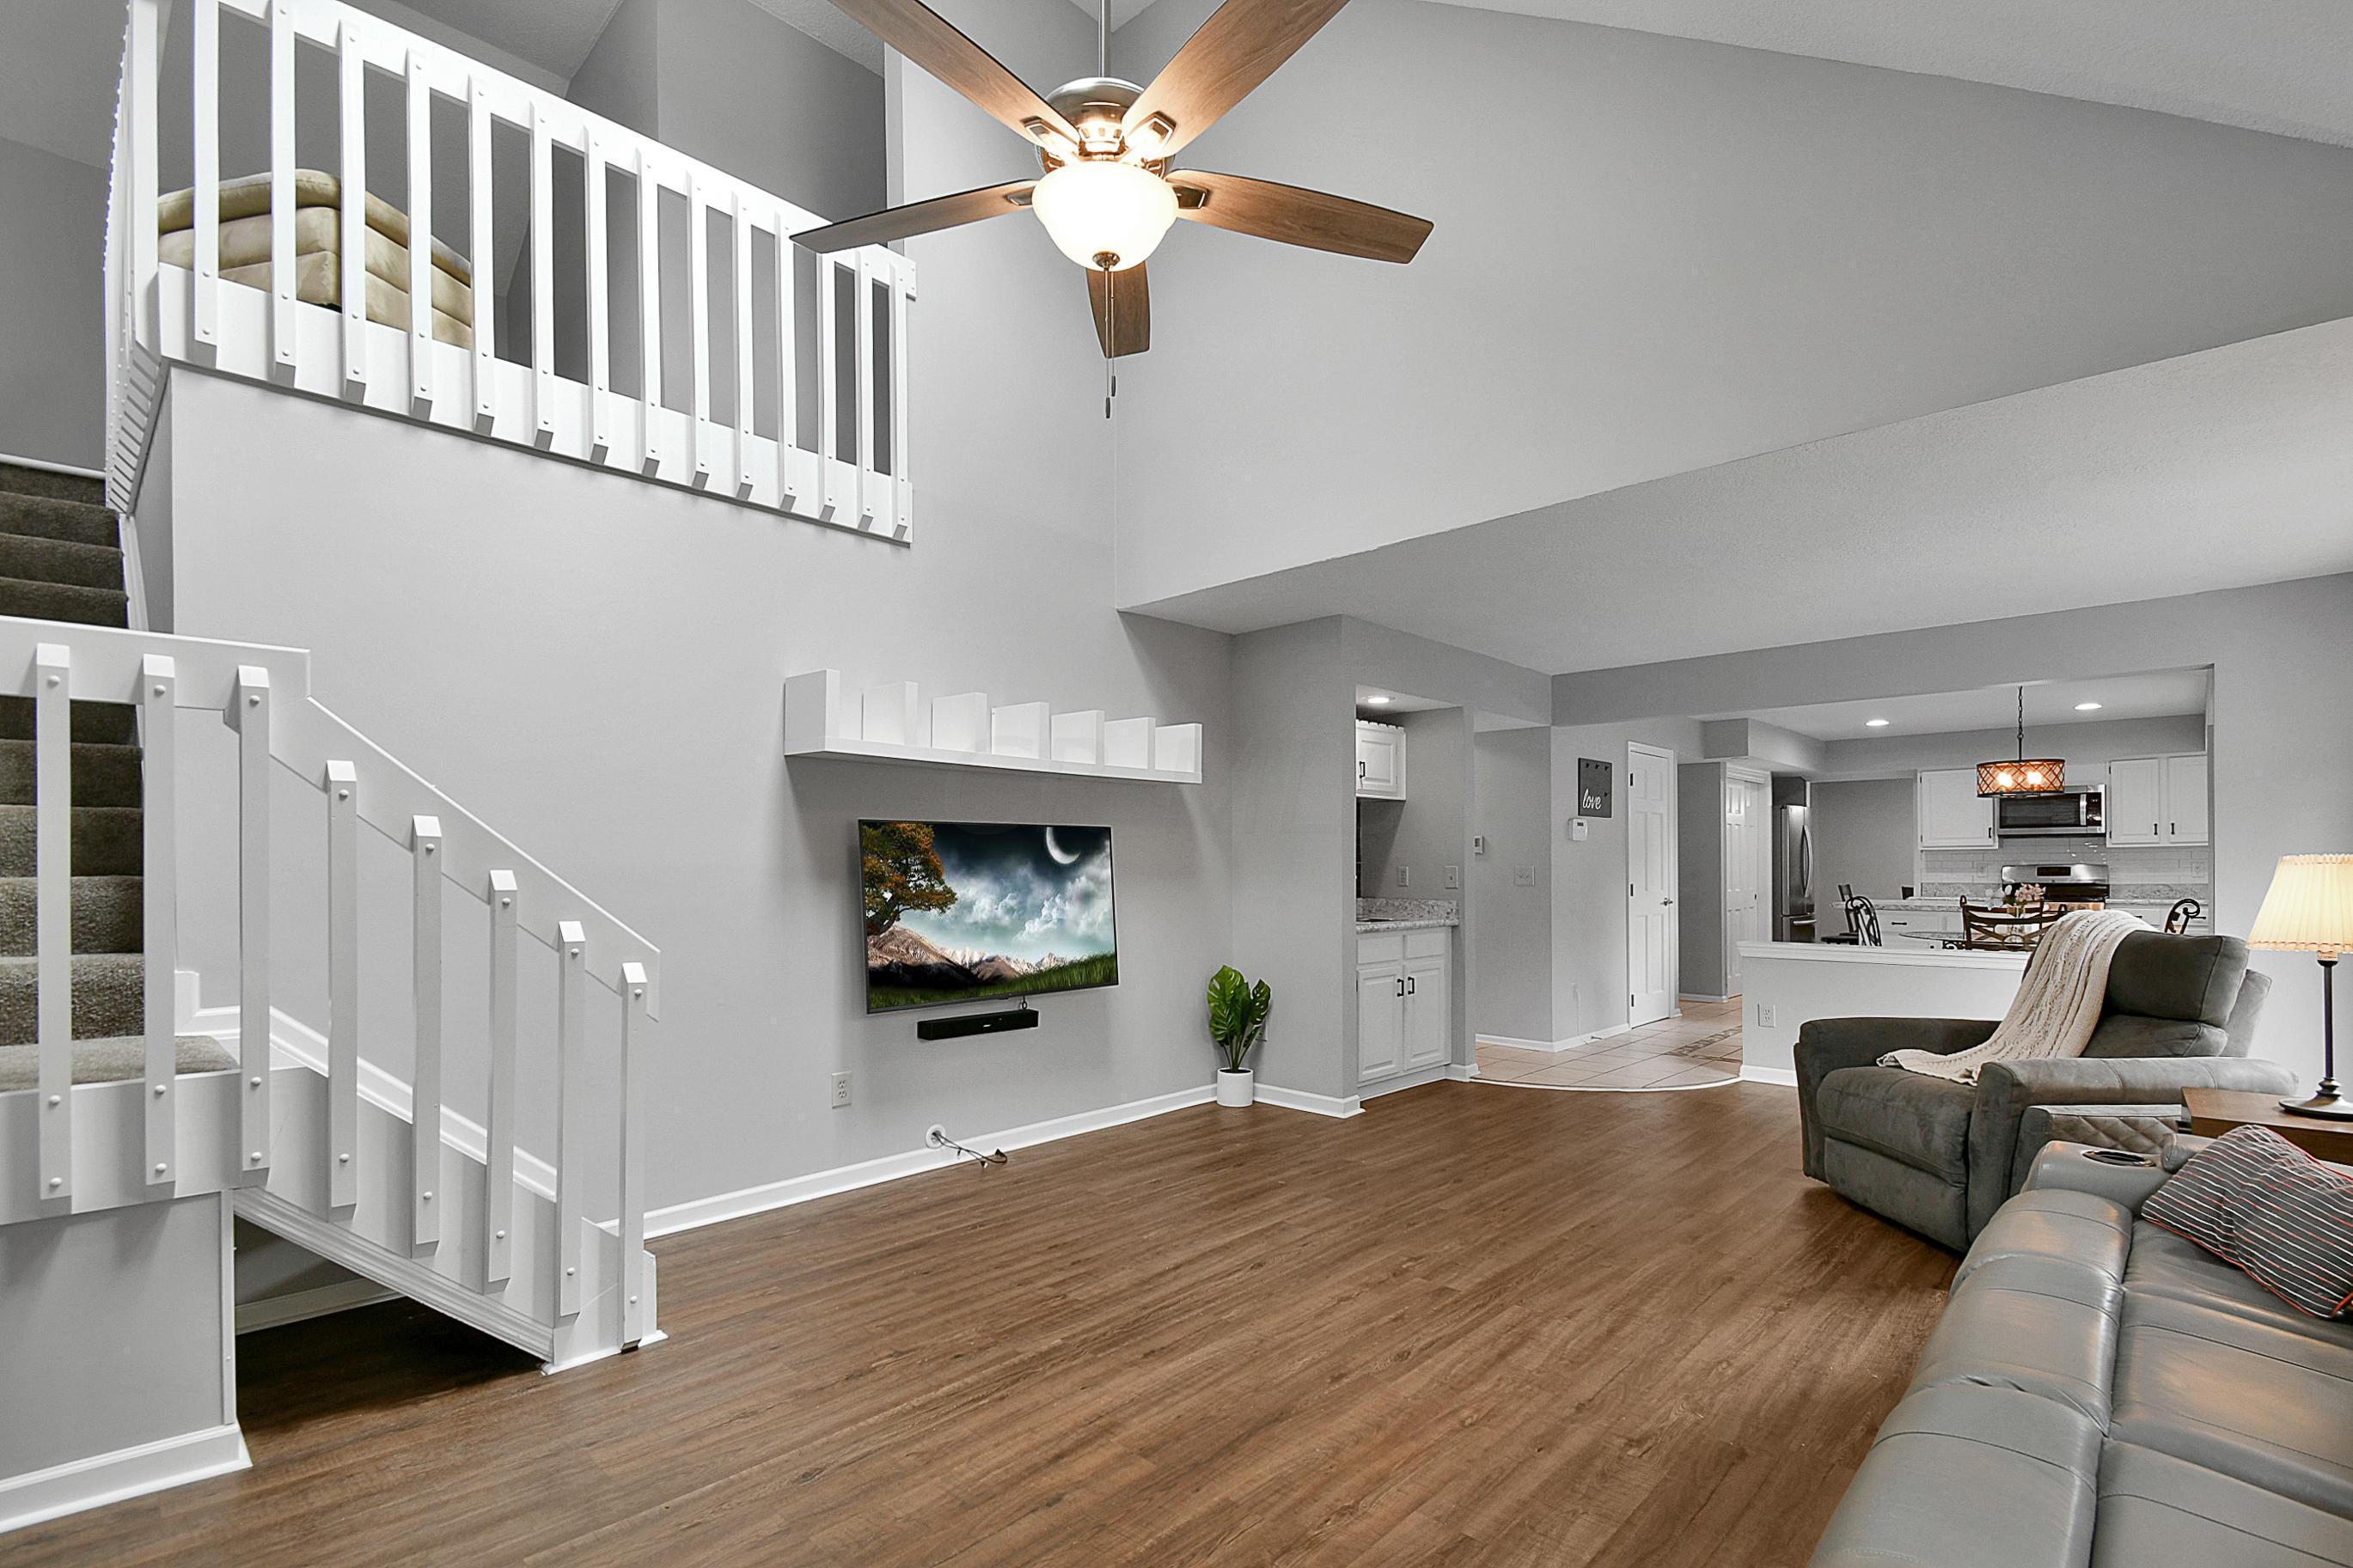 355 Ashworth Court, Dublin, Ohio 43017, 4 Bedrooms Bedrooms, ,4 BathroomsBathrooms,Residential,For Sale,Ashworth,220024643